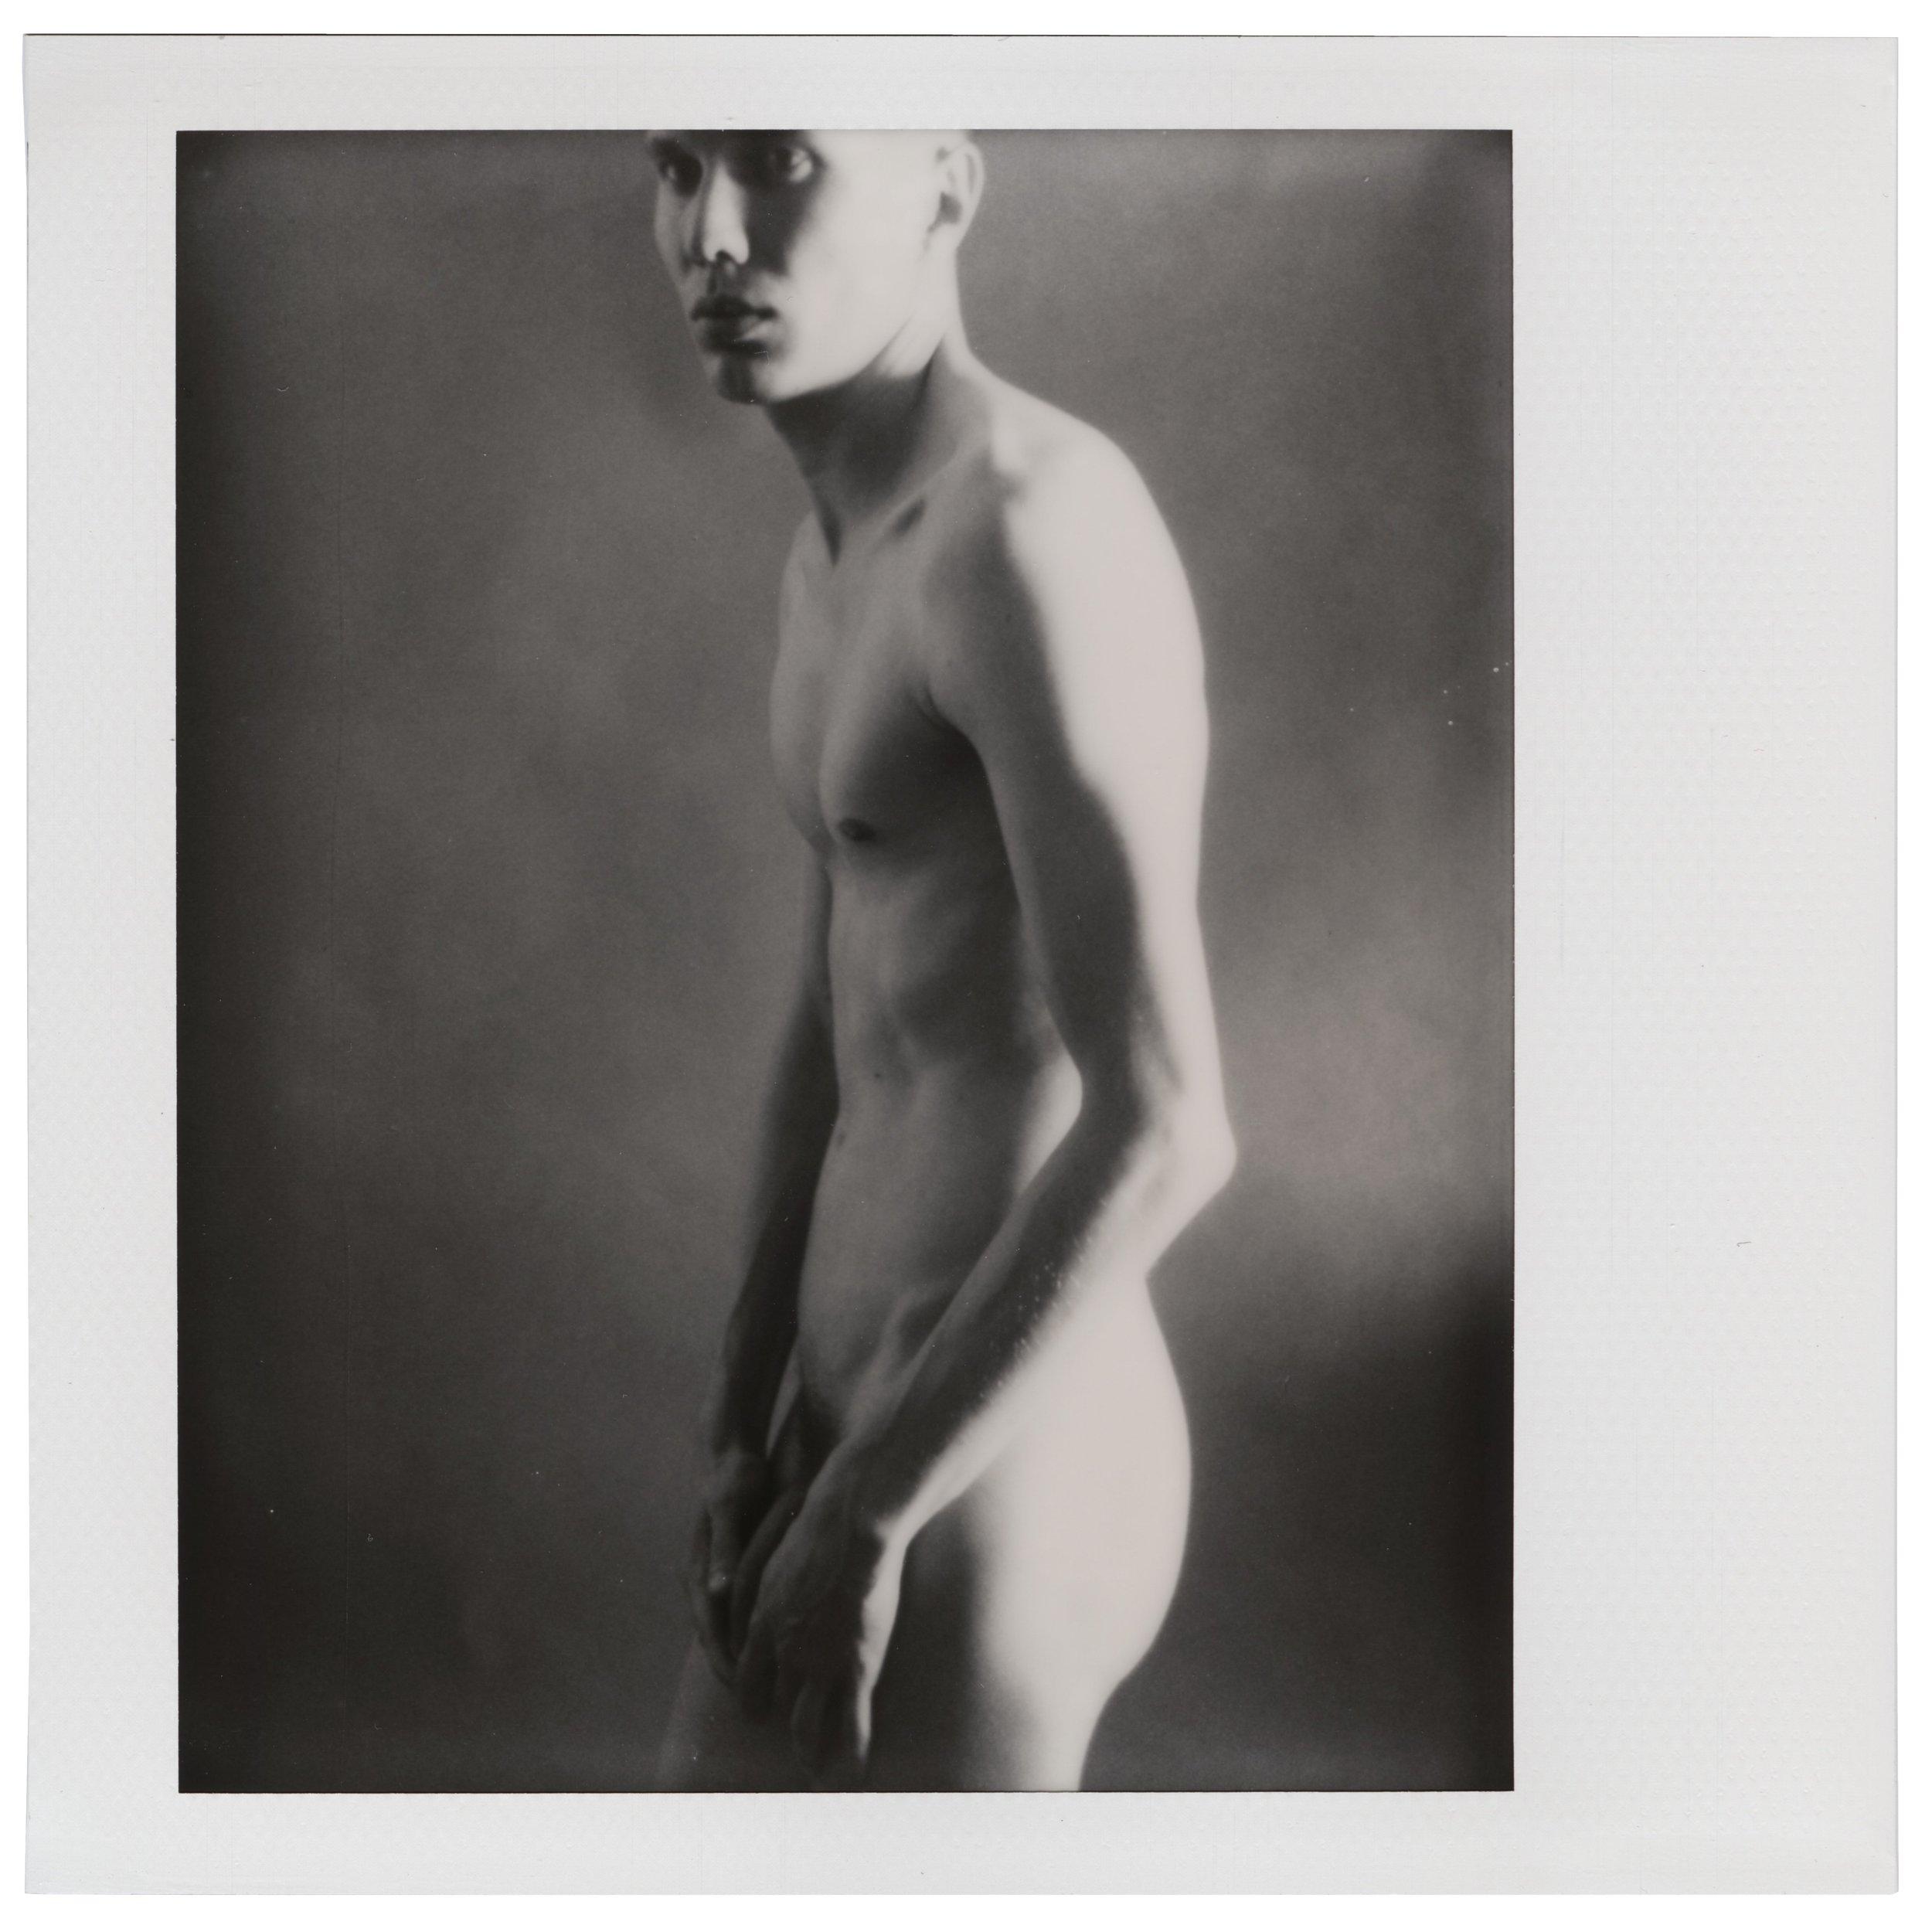 Self-portrait, June 3 2018 (Polaroid Spectra, Polaroid Originals) Thobias Malmberg